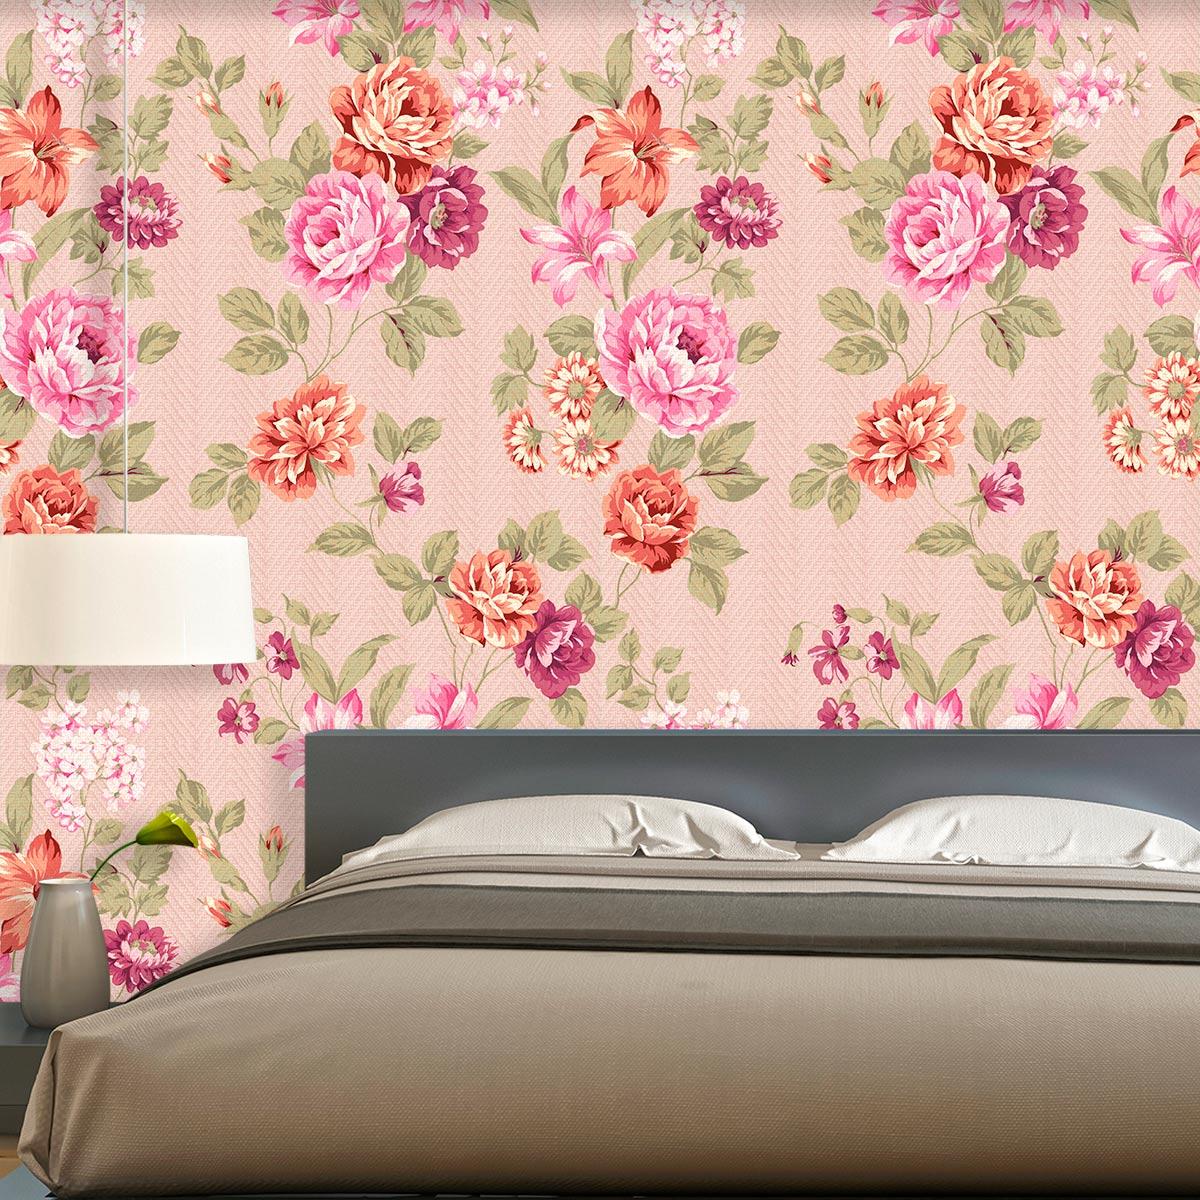 Papel de Parede Floral Rosas Tons Rosa Laranja Lilas Adesivo